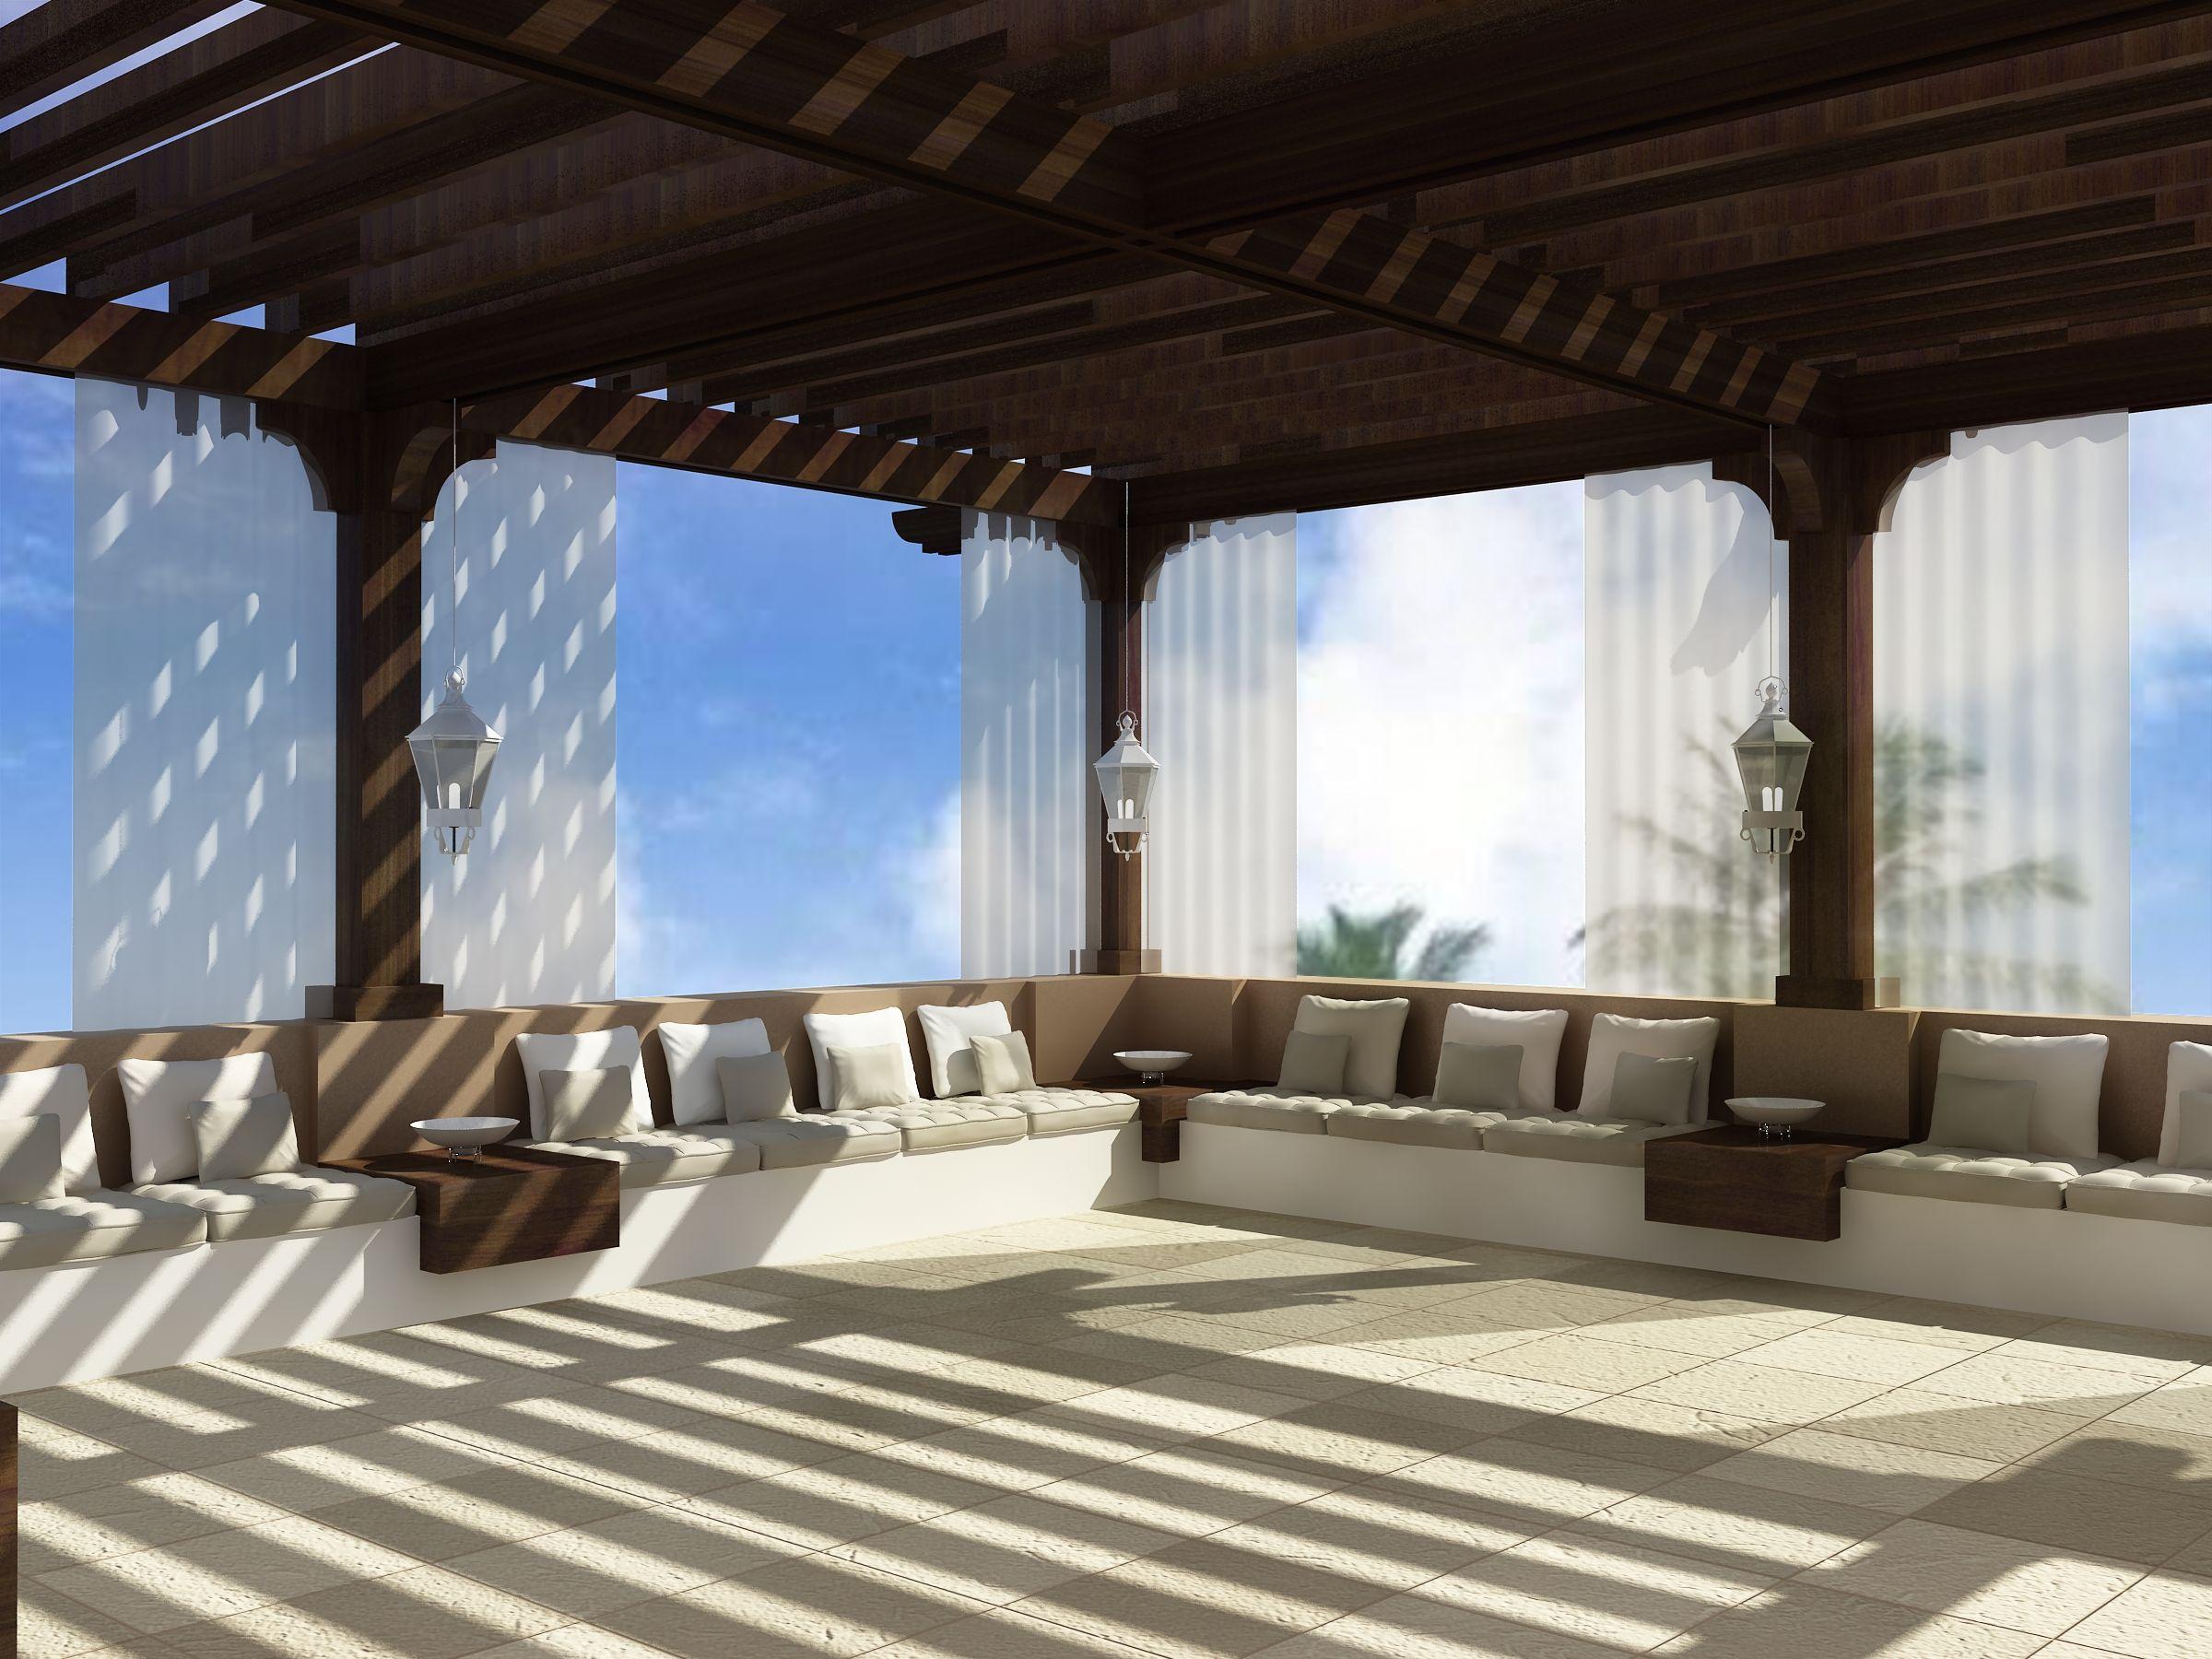 Arabian Roof Majlis Design | Boudoir Interiors Majlis ...